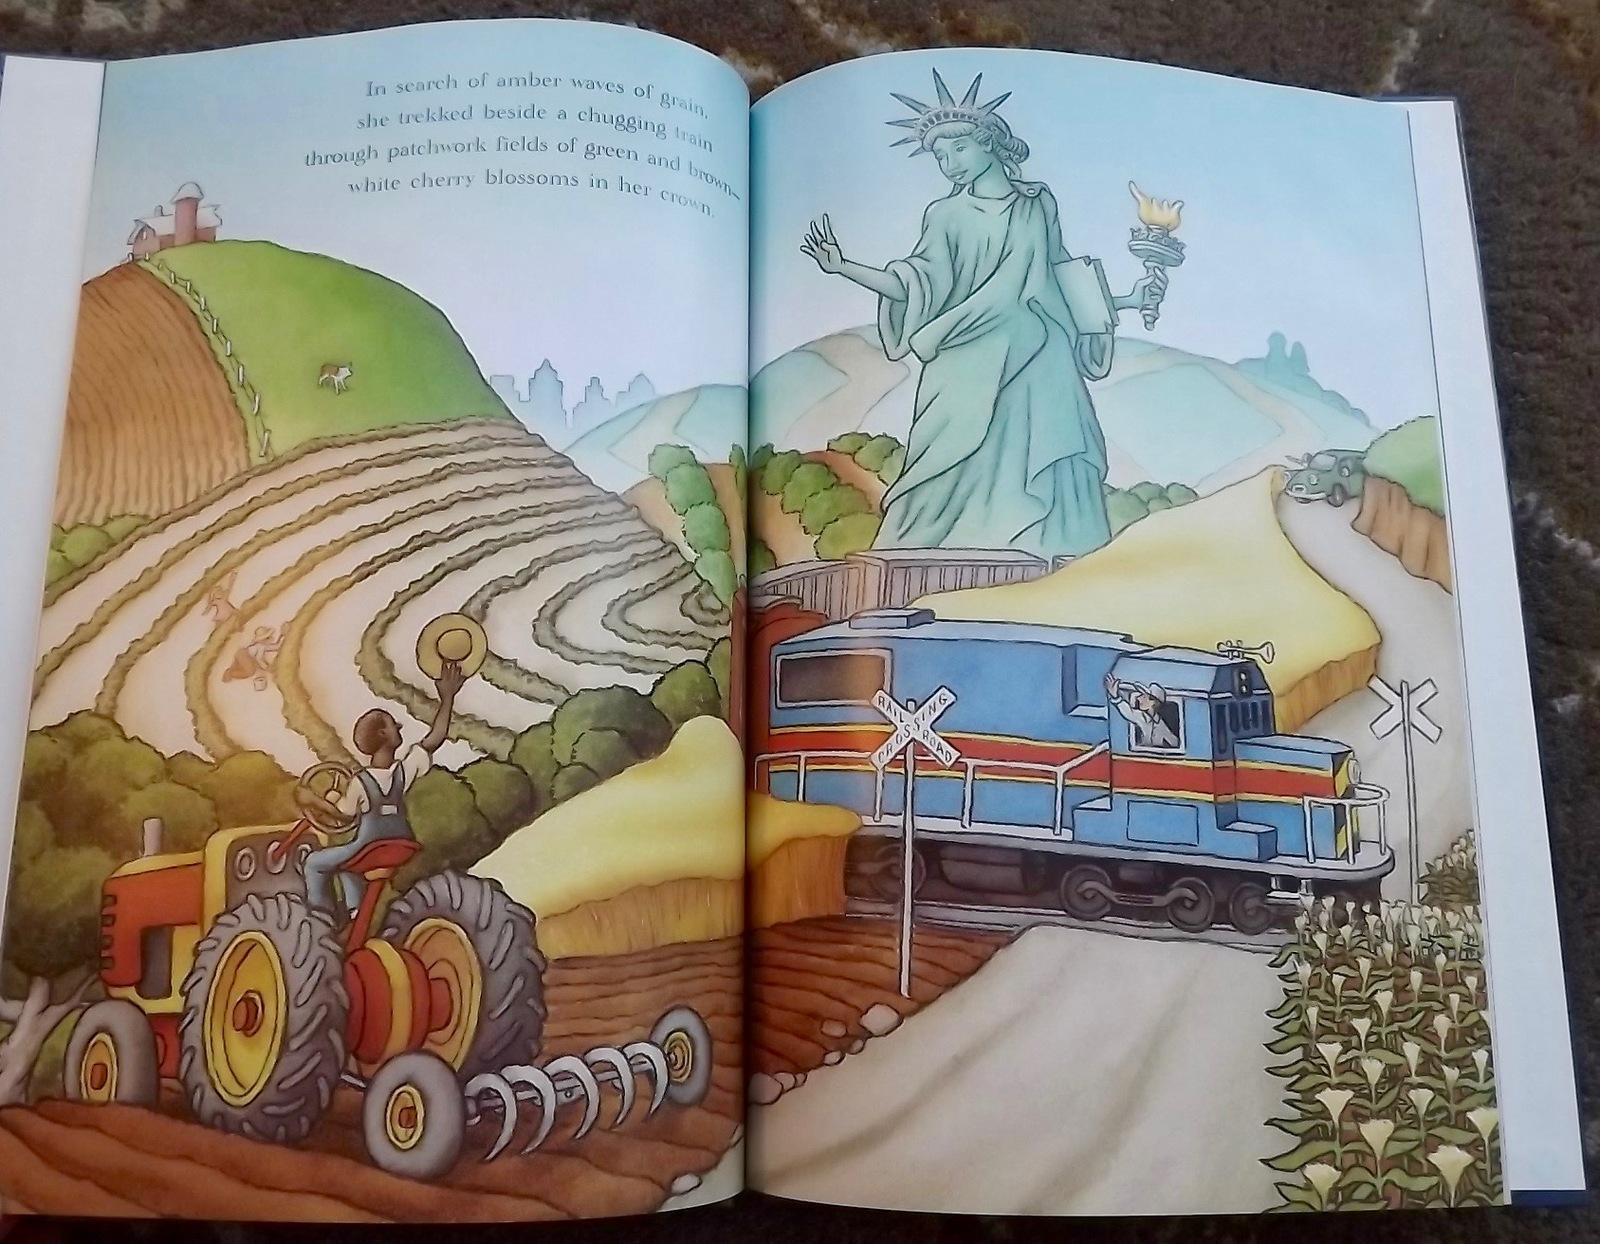 3 Richard Egielski books The Tub People, The Tub Grandfather, Liberty's Journey